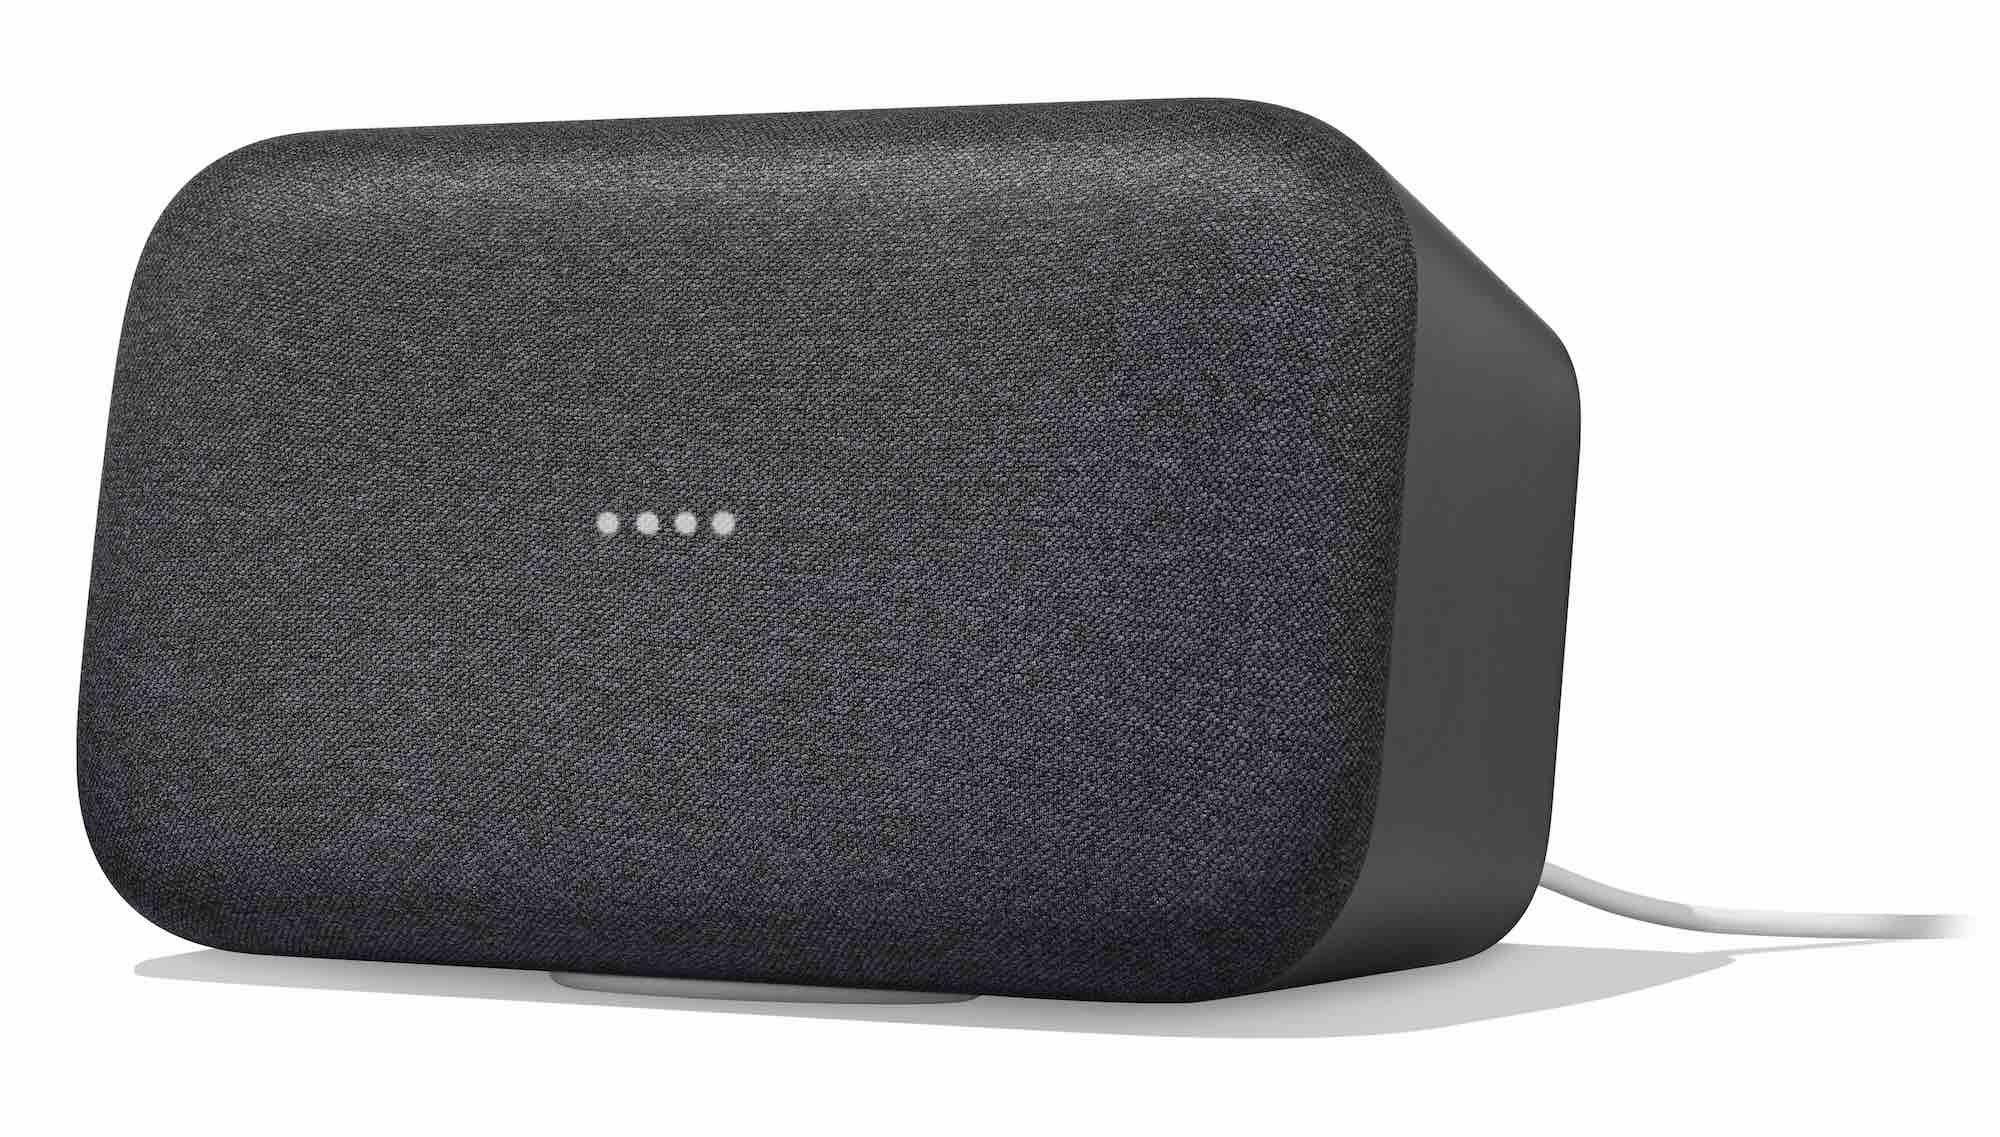 black google home max speaker